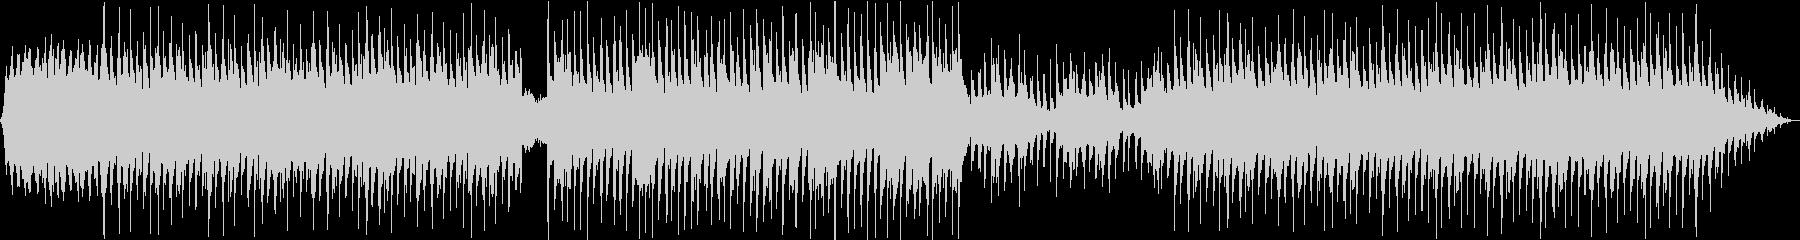 Lo-fi ピアノ vlog カフェの未再生の波形